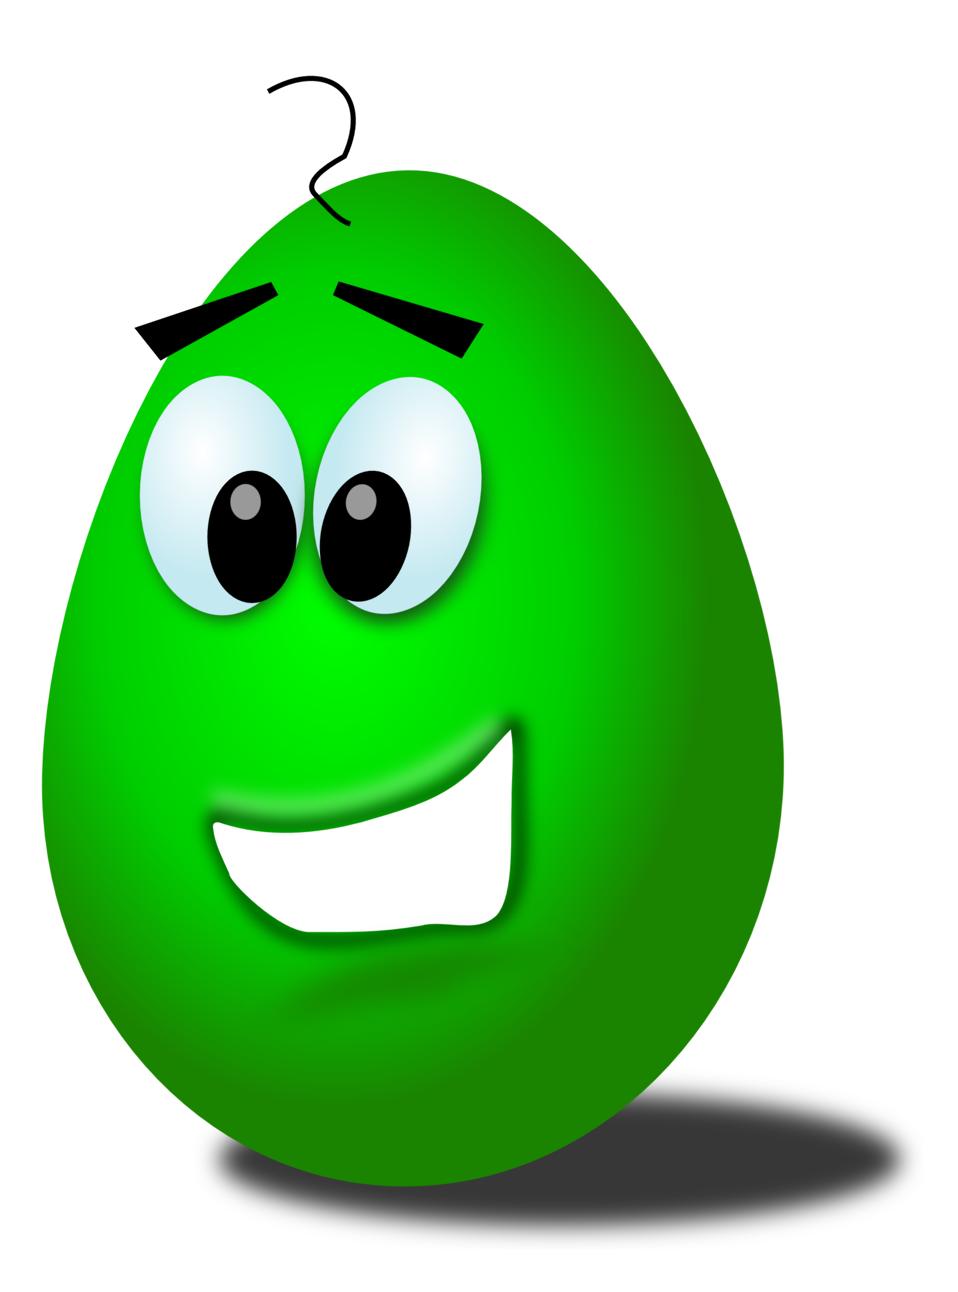 green comic egg